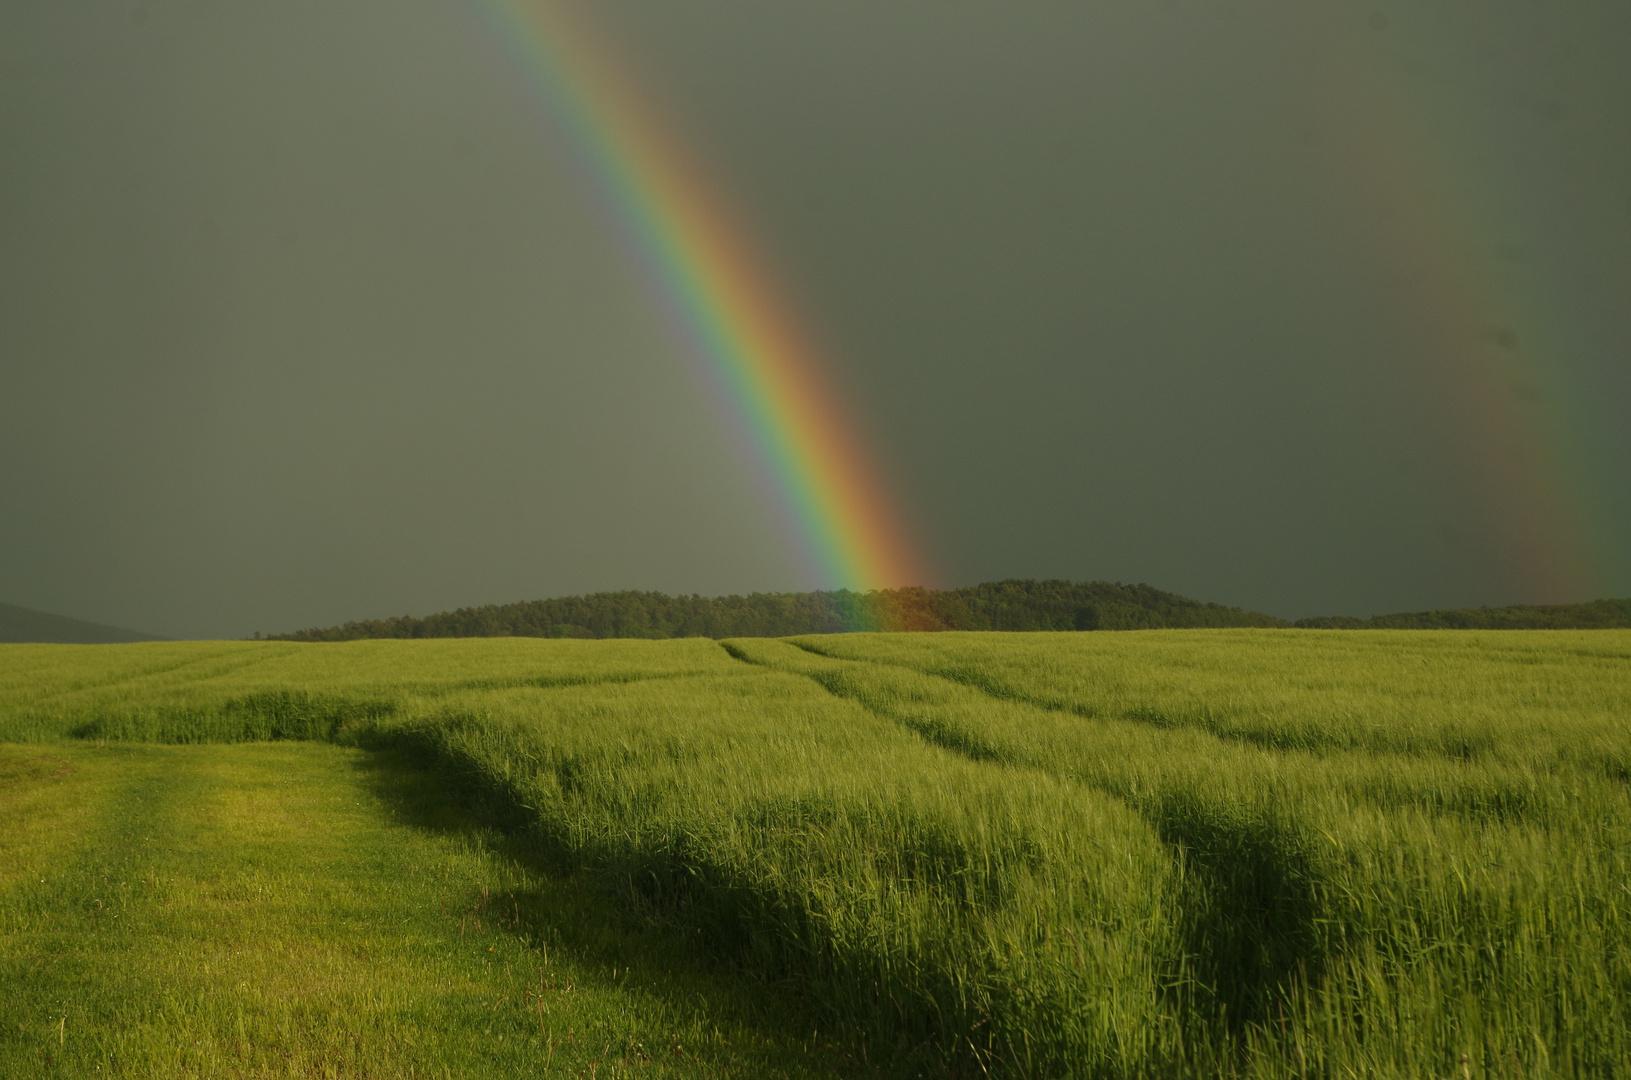 Regenbogen trifft Feld